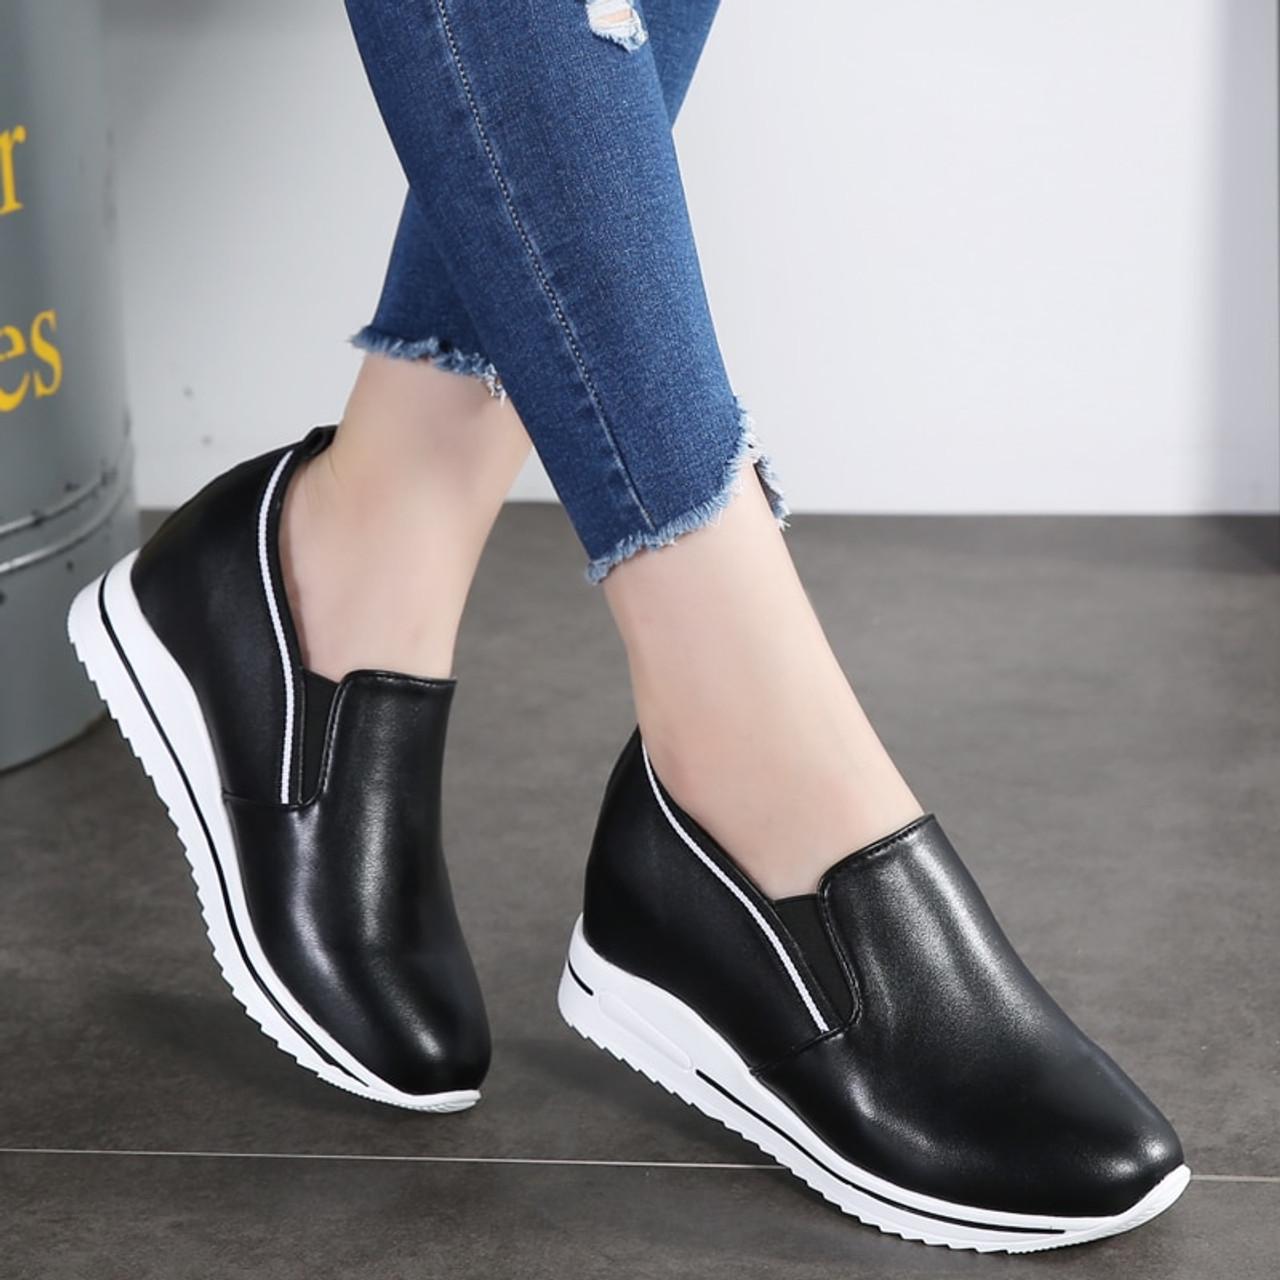 AODLEE Increasing Flat Shoes Women